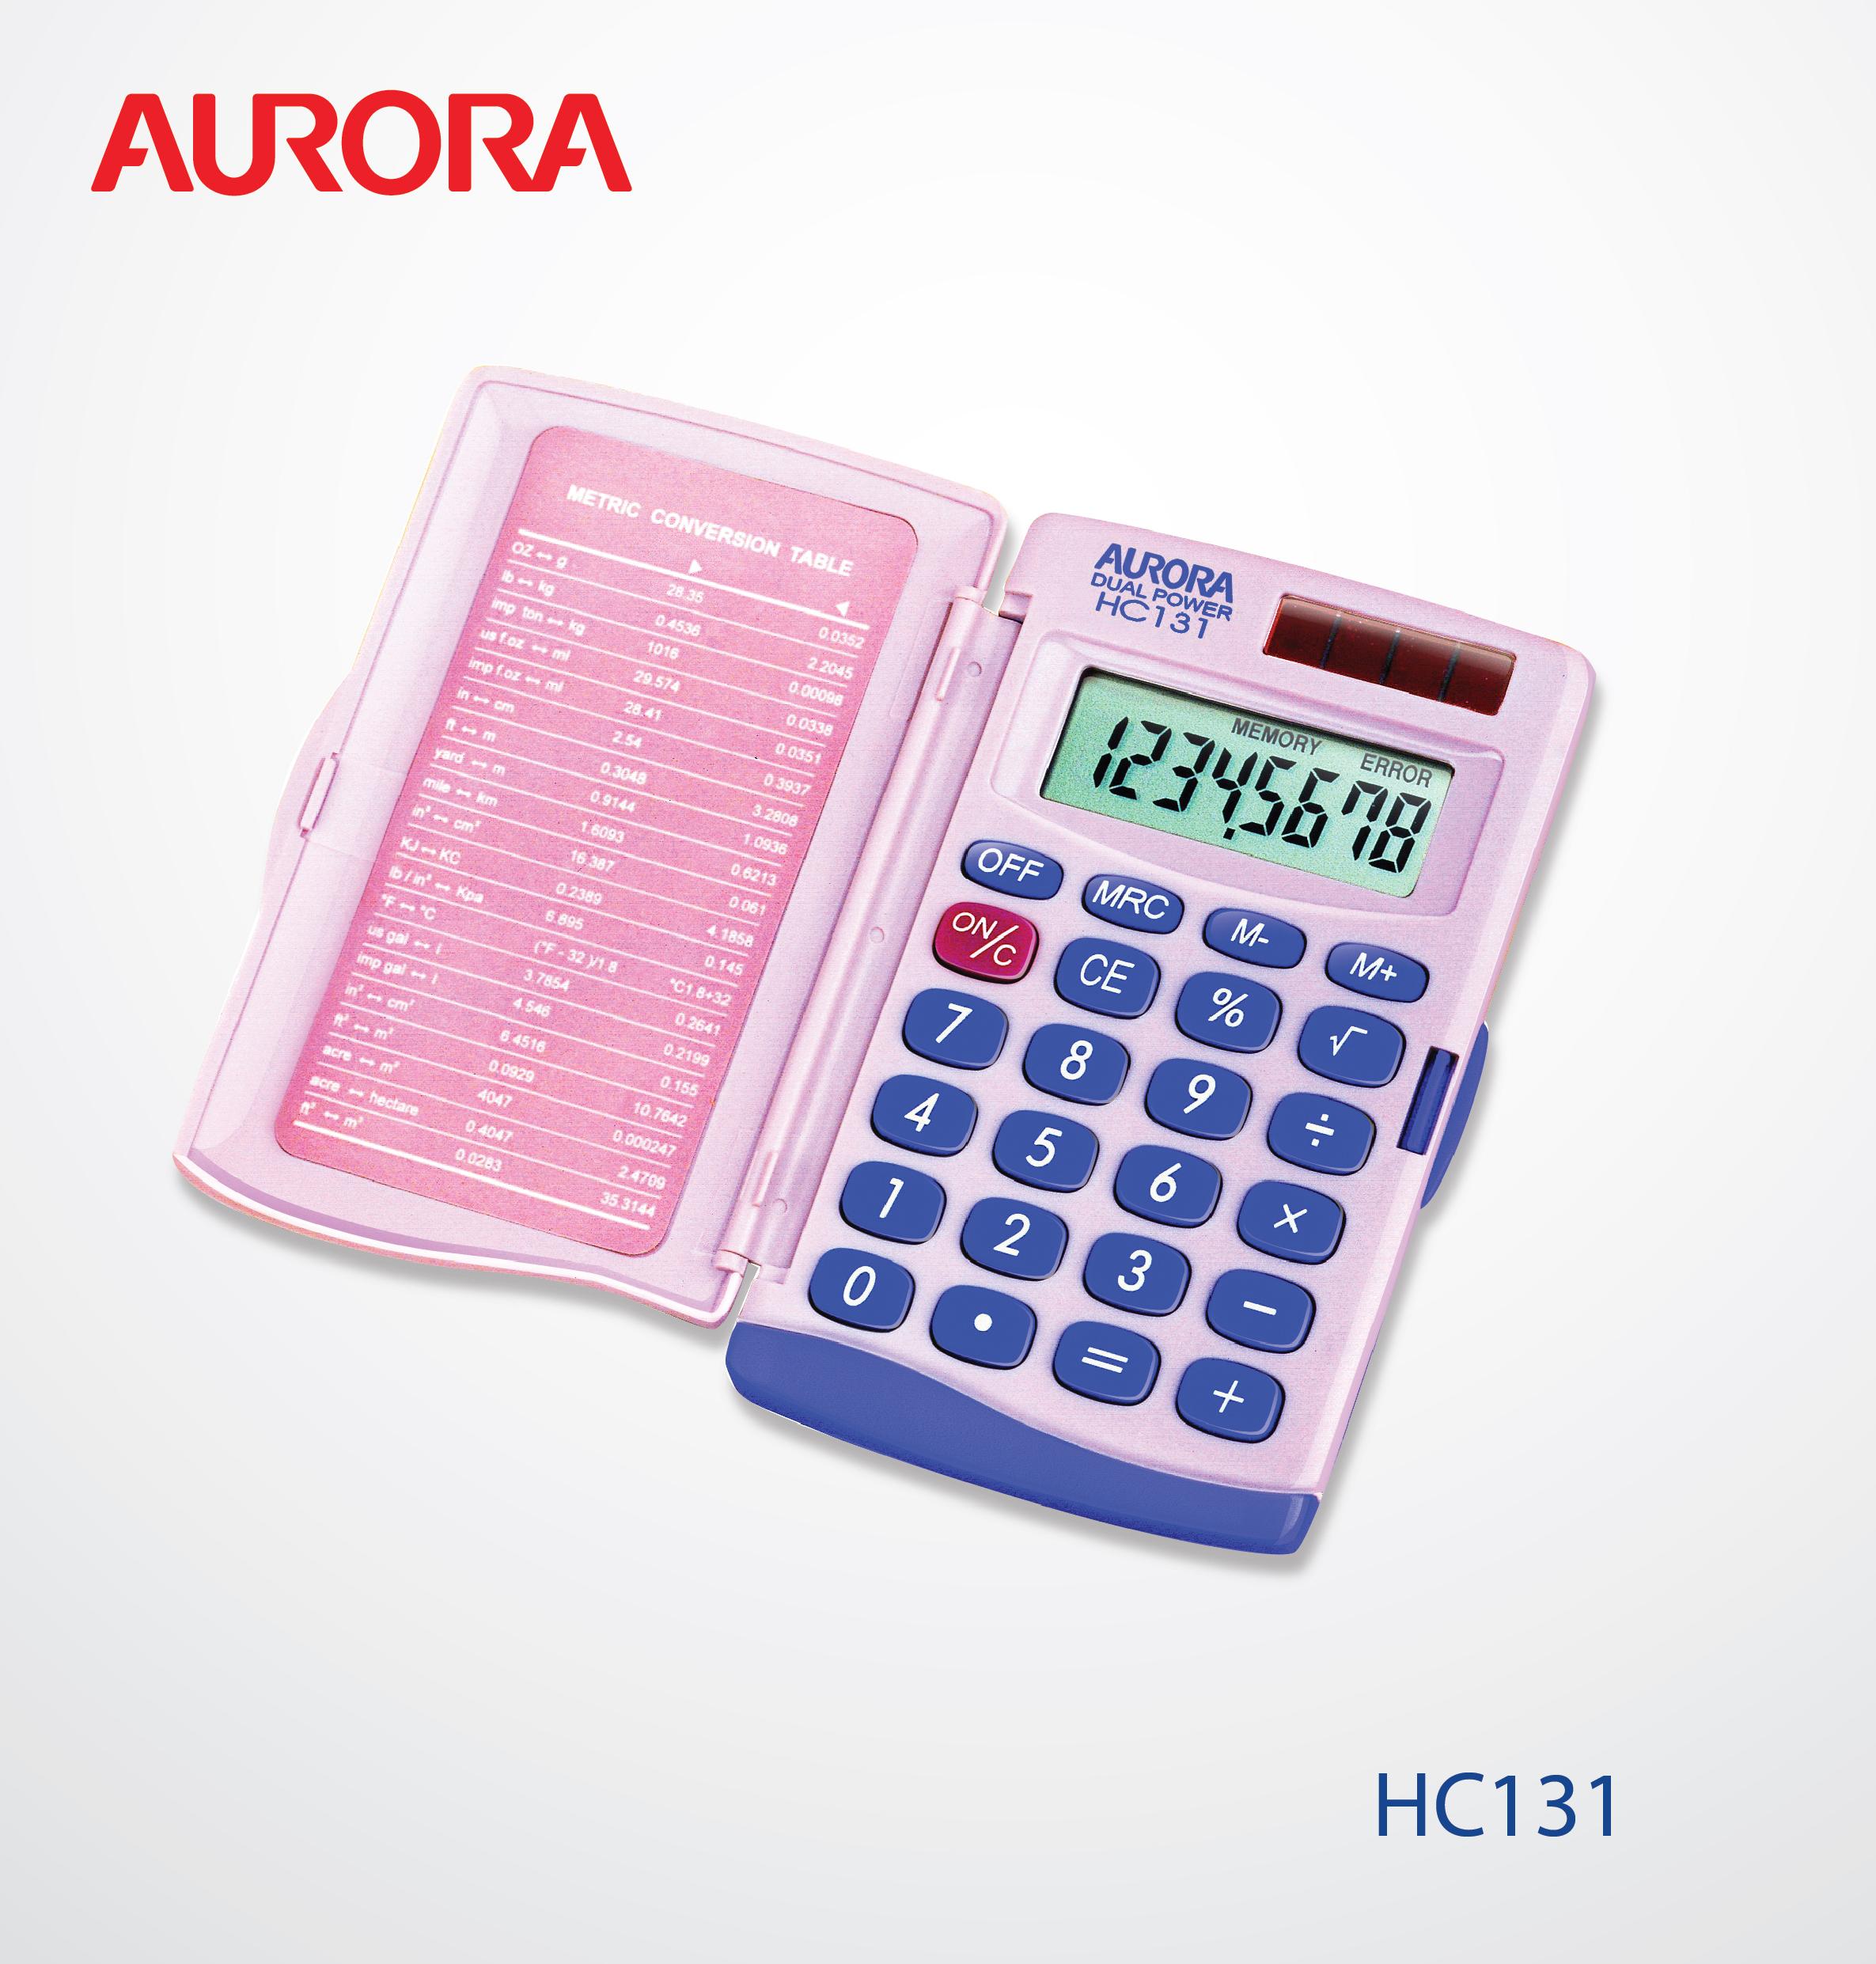 Aurora Calculator_HC131 copy